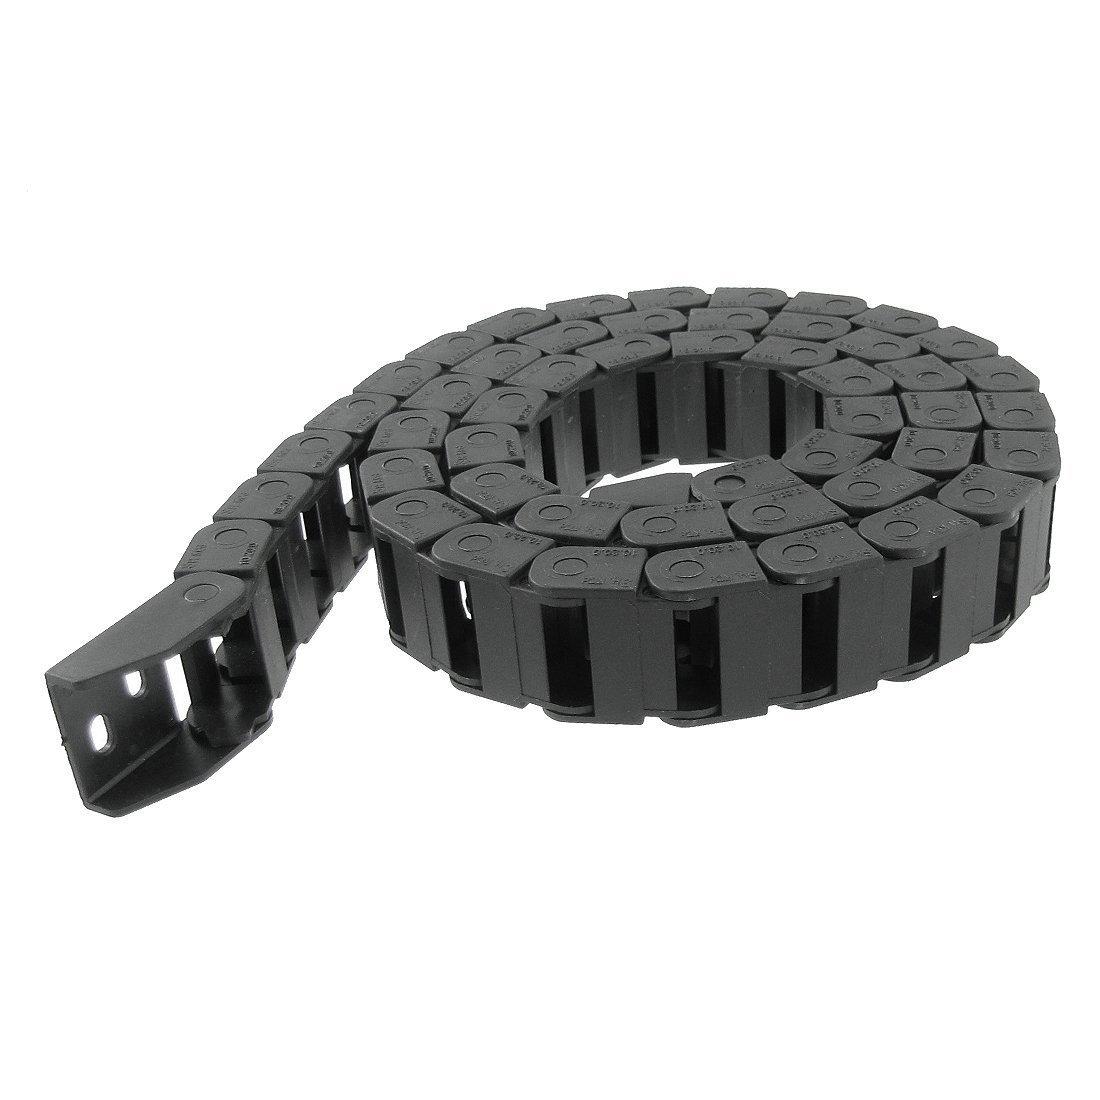 Copapa PlasticTowline CNC Machine Tools Cable Carrier Drag Chain (10X20mm)